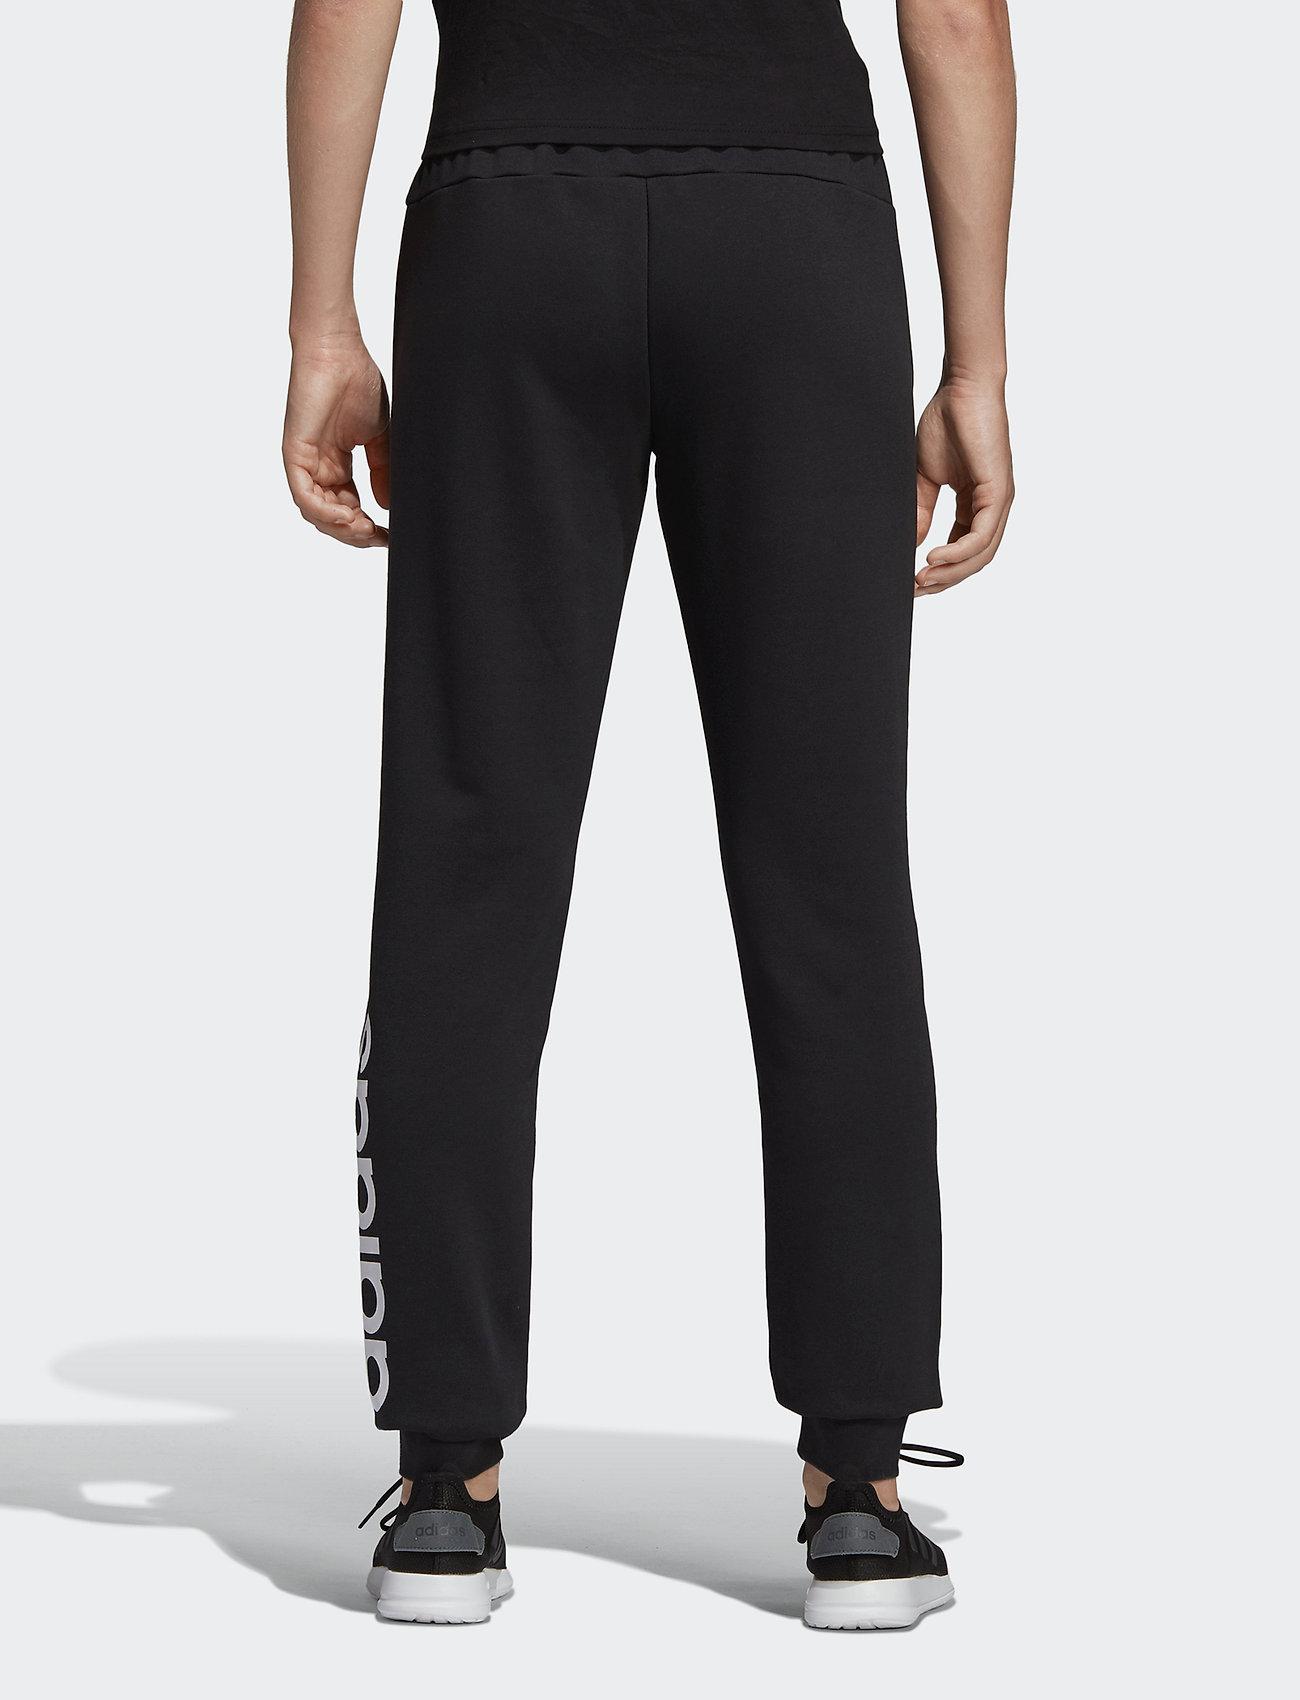 W E Lin Pant (Black/white) (364.65 kr) - adidas Performance